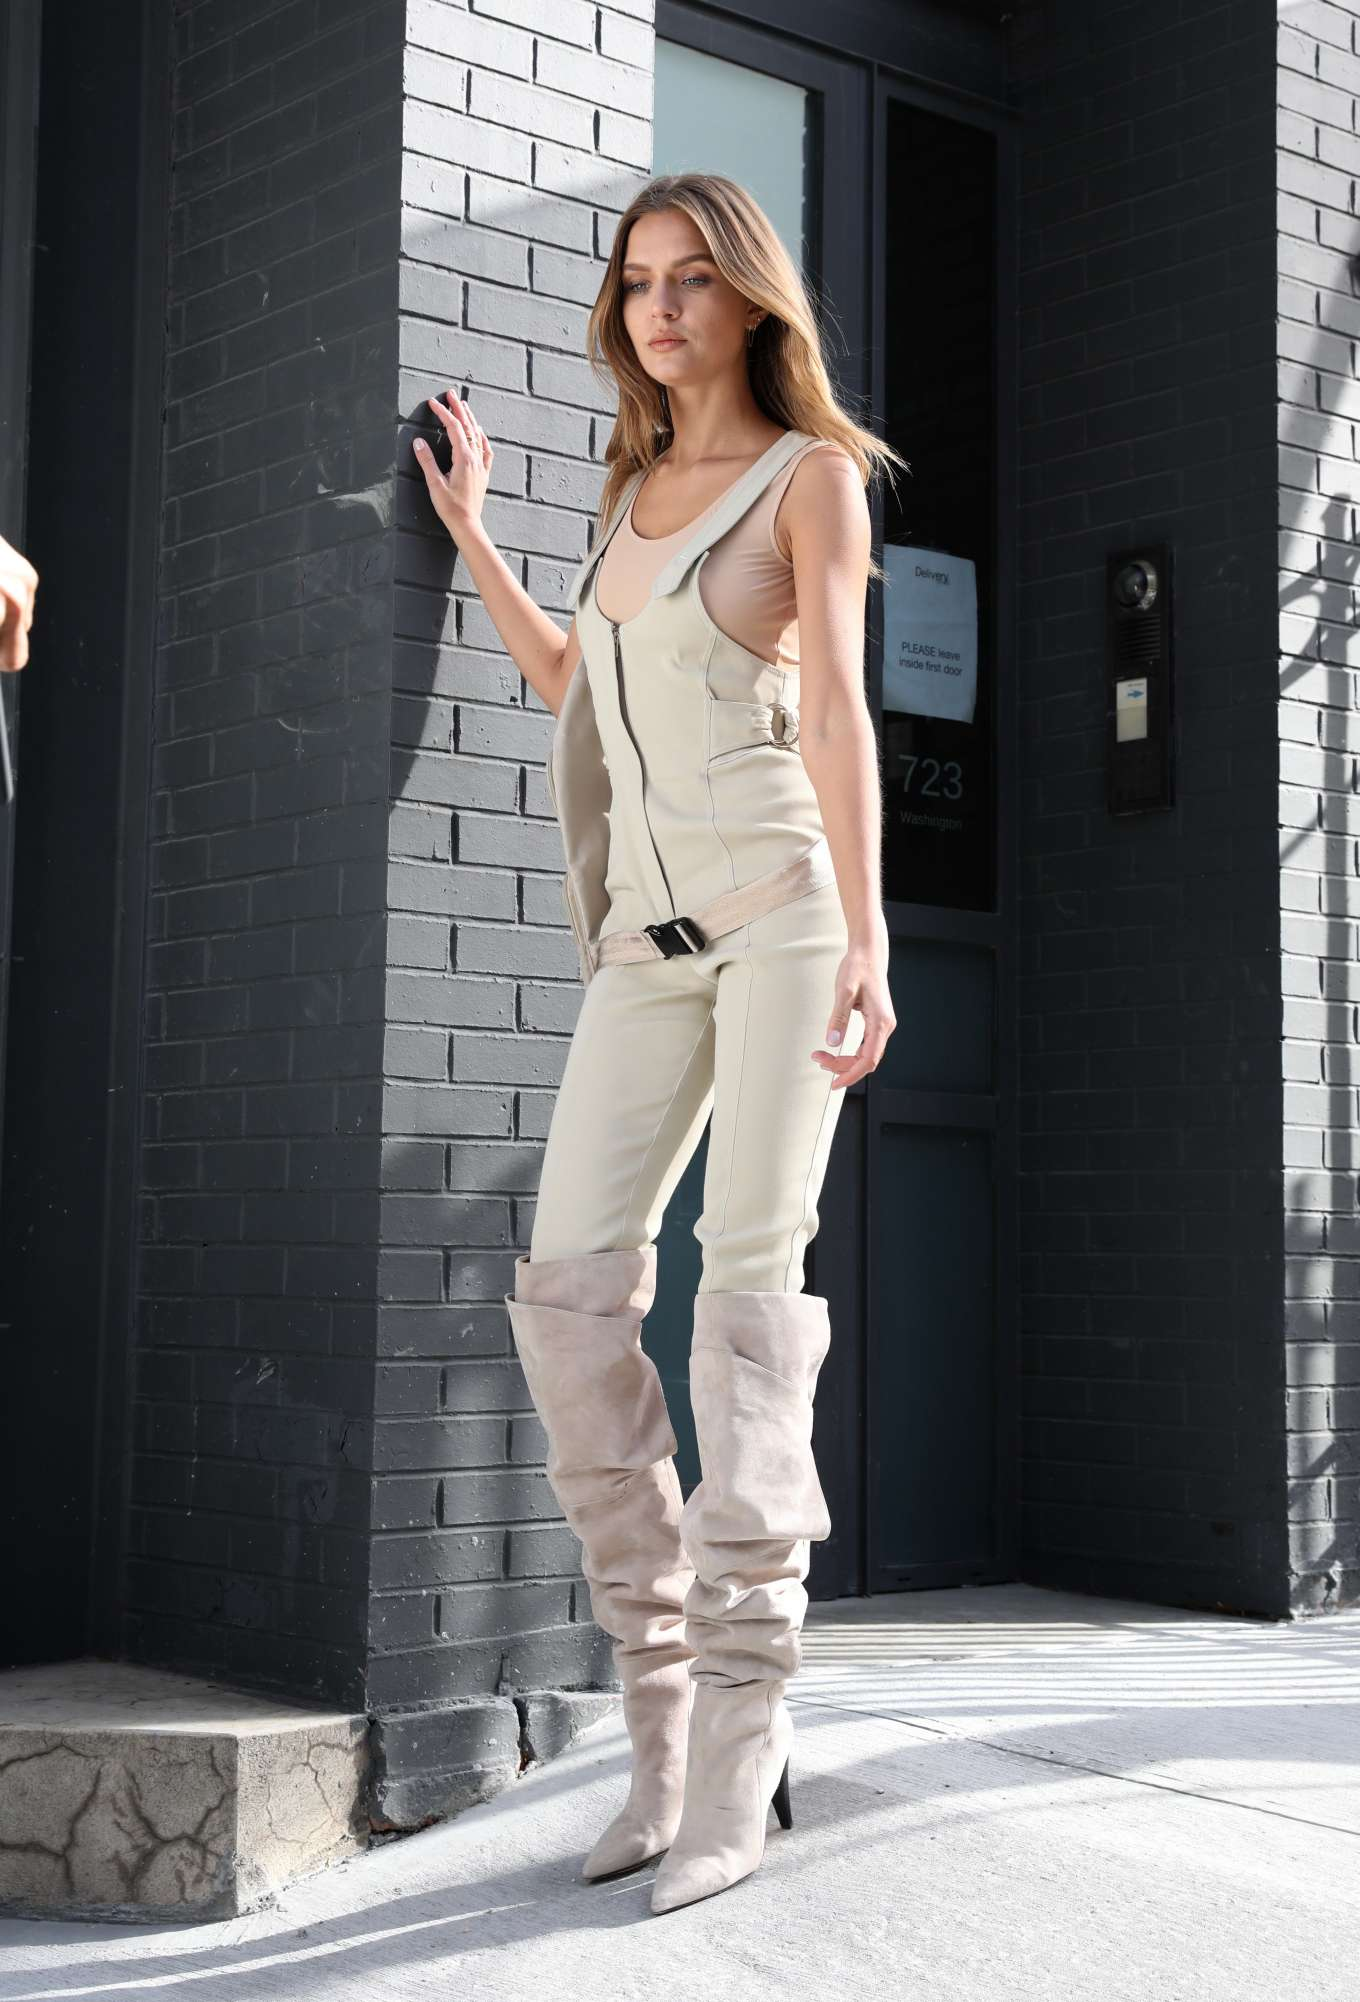 Josephine Skriver 2020 : Josephine Skriver – Maybelline photoshoot set in Manhattan-05